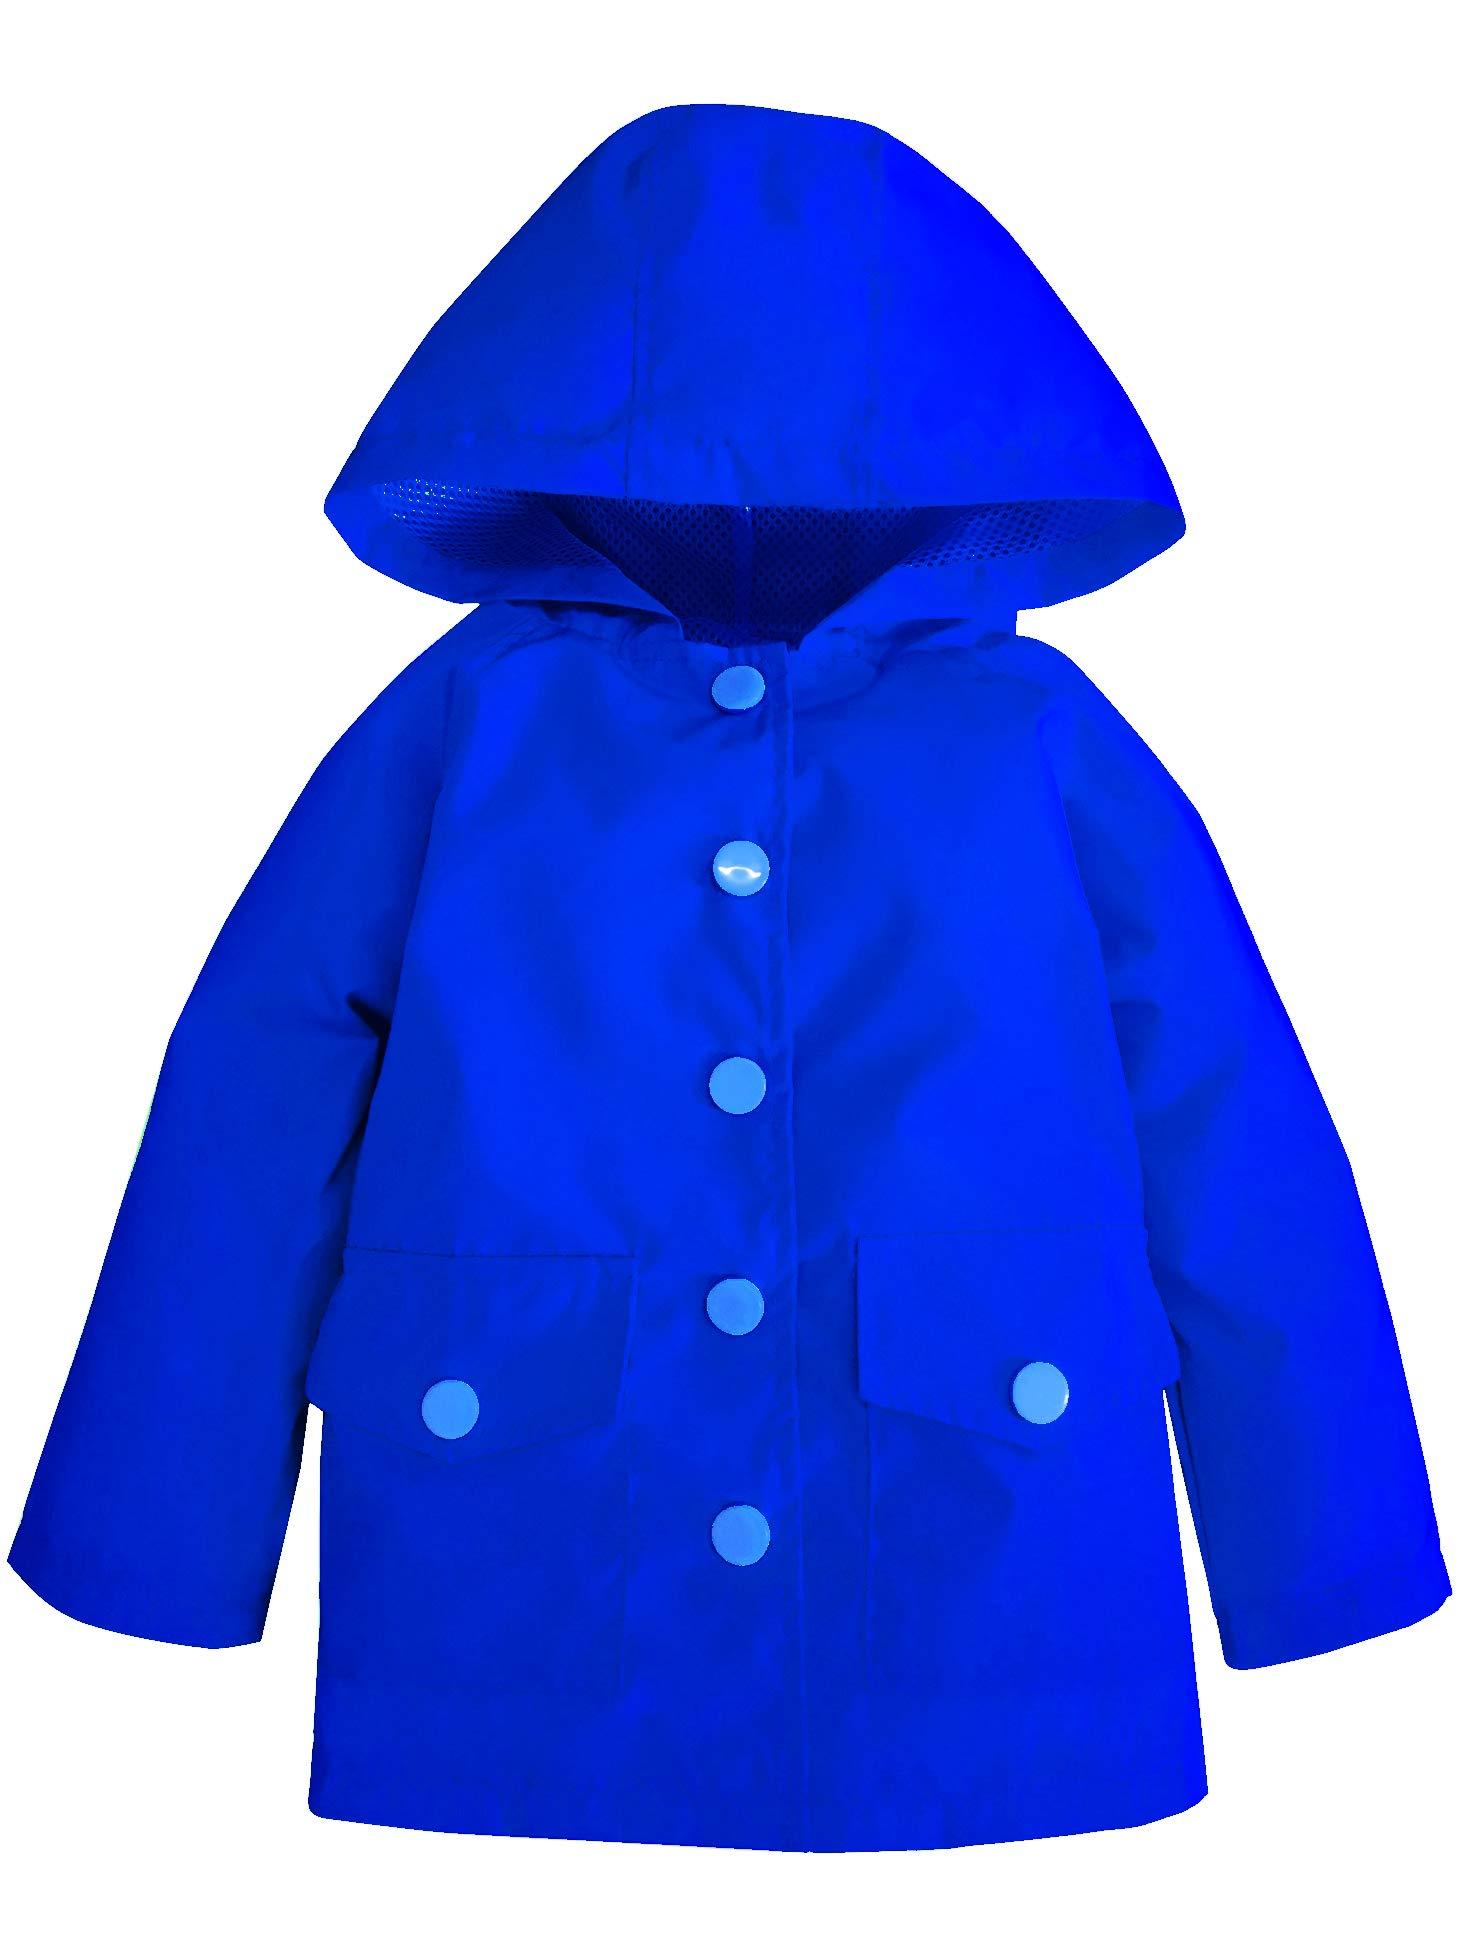 YNIQ Little Kids Waterproof Lightwight Coat Jacket Raincoat with Hooded for Big Boys Blue